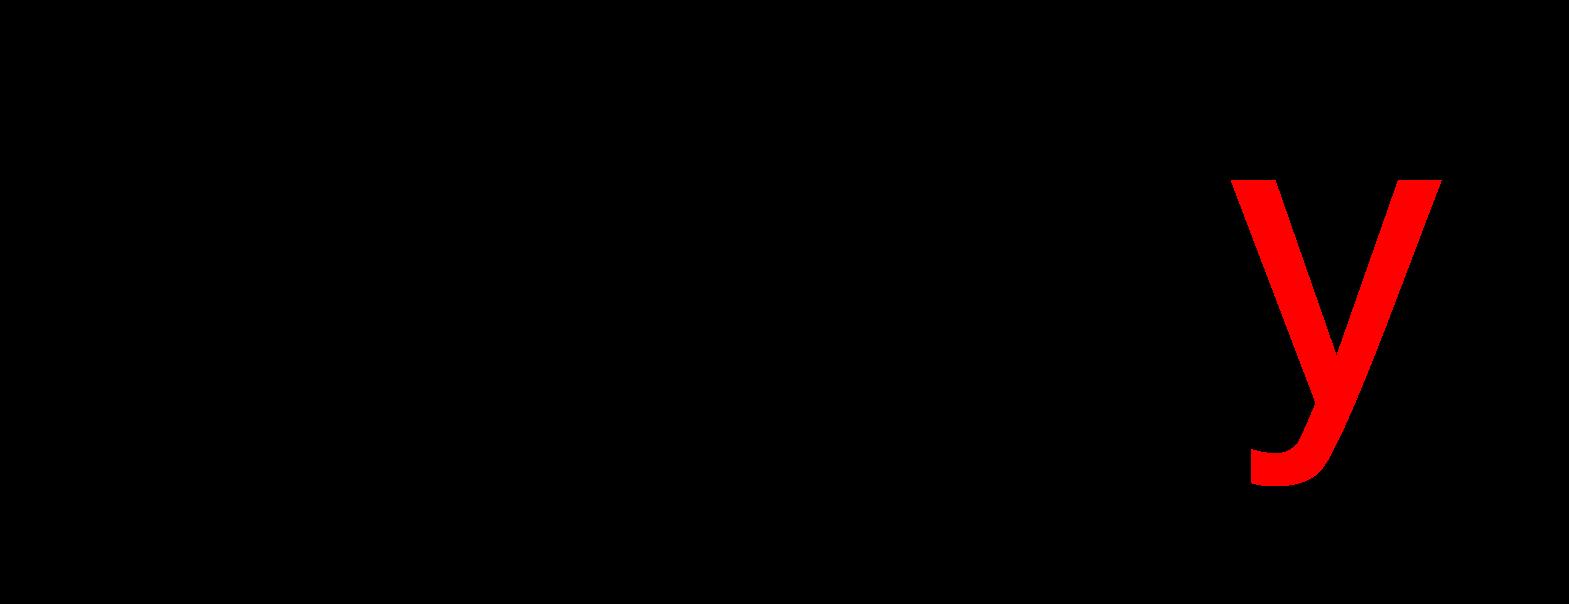 LRSDAY logo